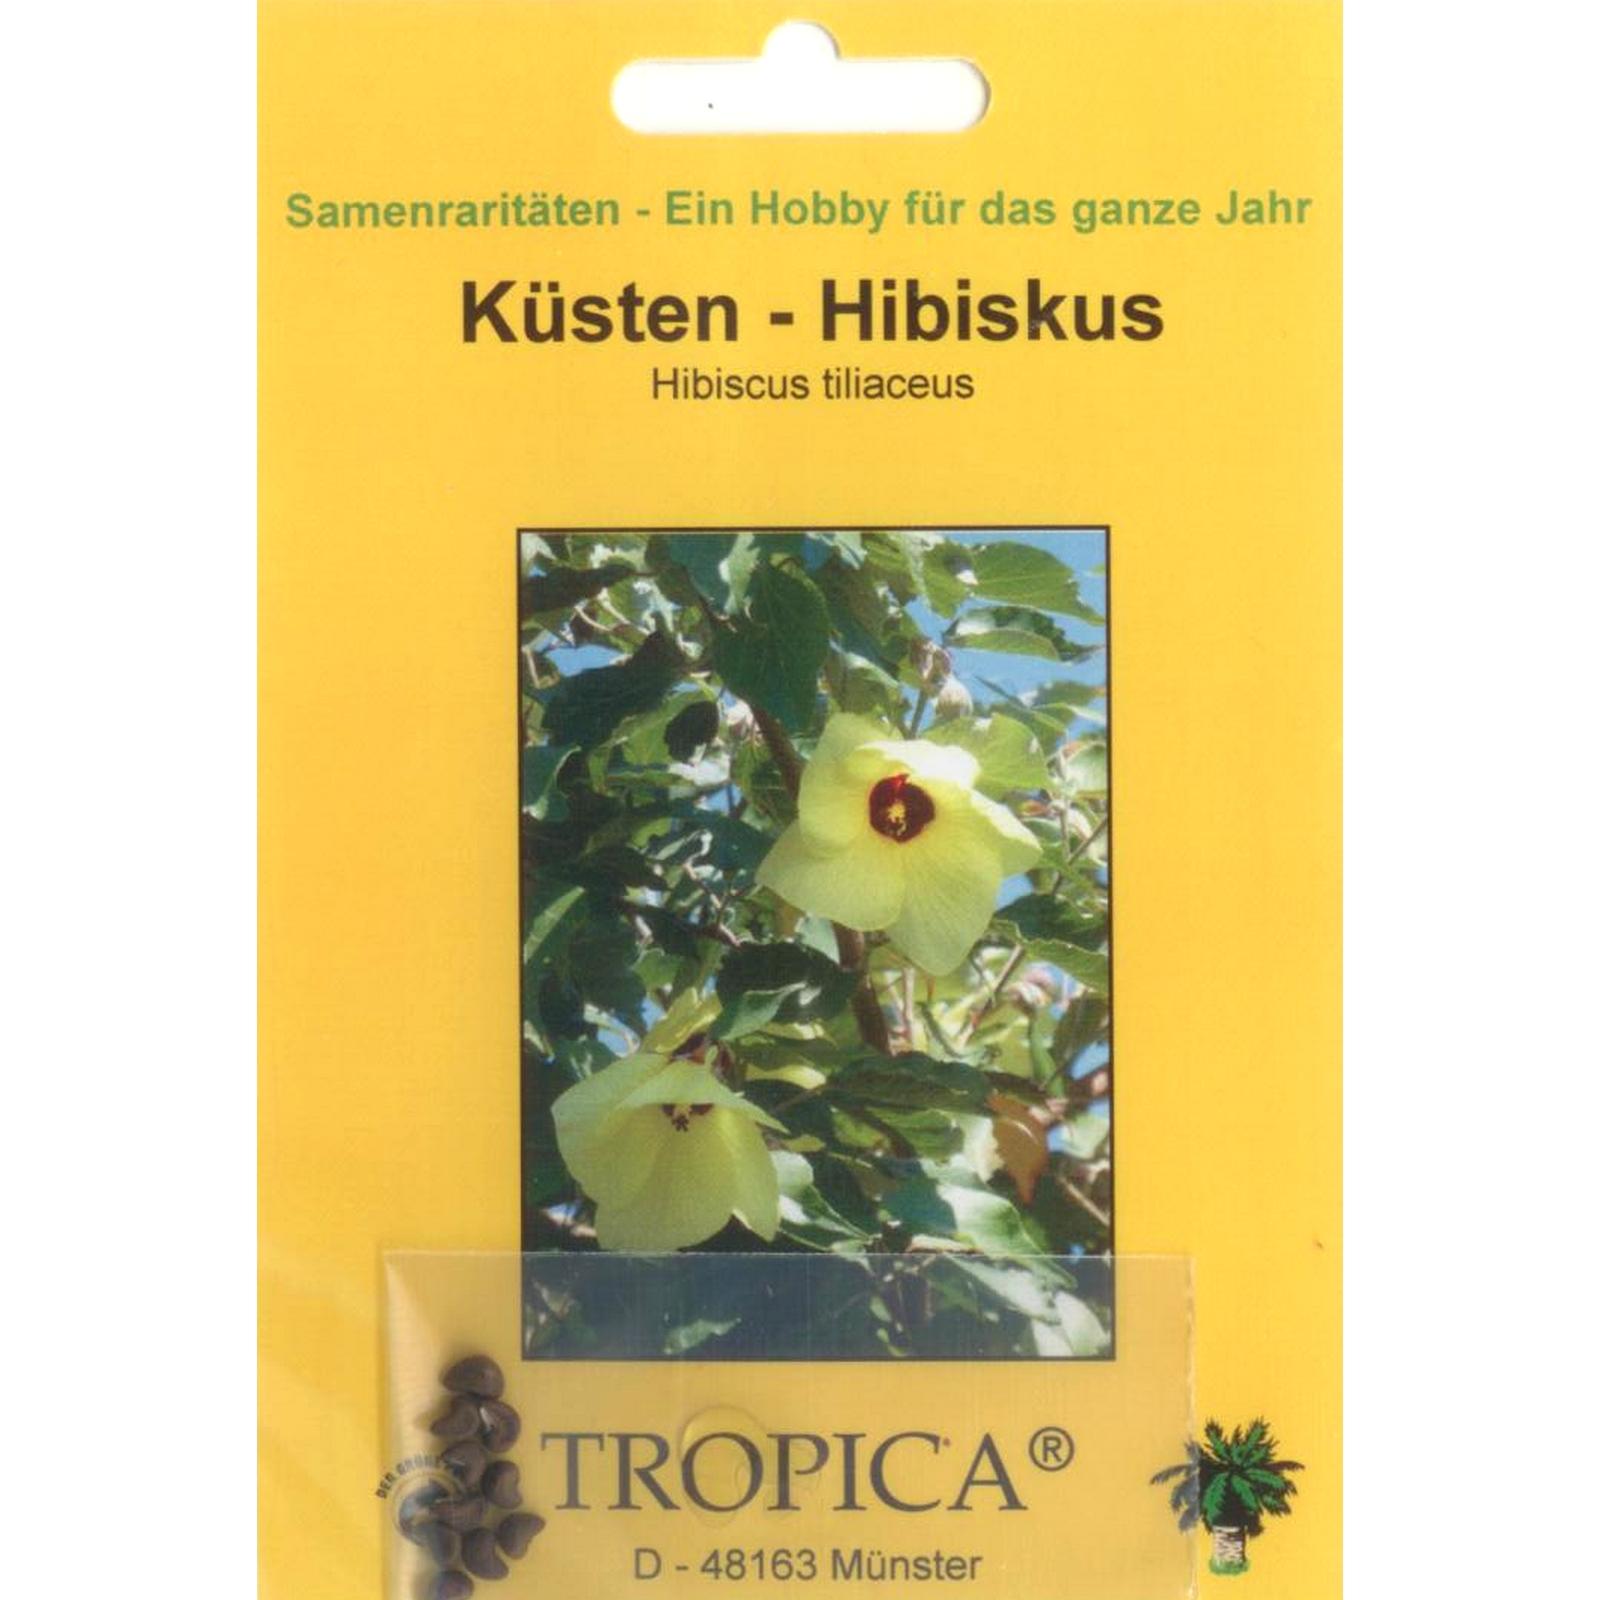 Hibiscus tiliaceus 90053 Küsten-Hibiskus Bonsai 15 Samen v